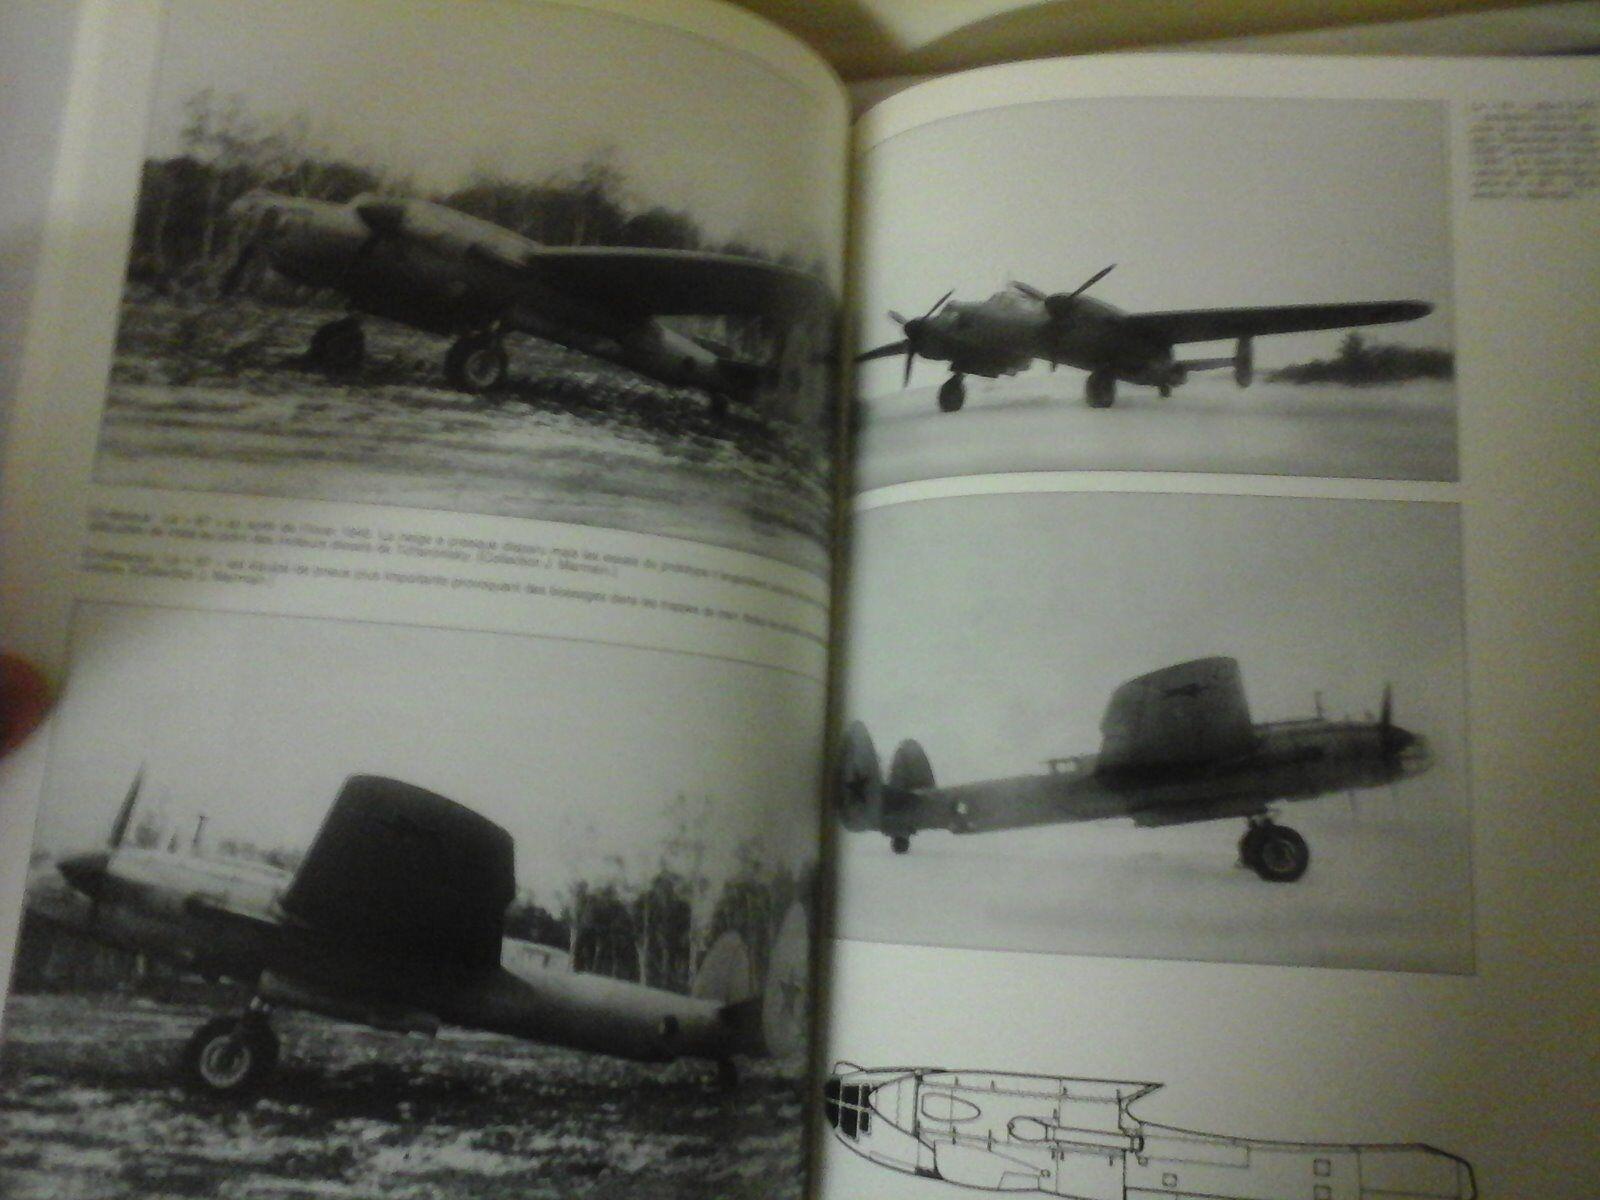 LE TOUPOLEV 10 TU-2 6 8 10 TOUPOLEV 12 & ProssoYPES HISTORIQUE -BY H. LEONARD- HEIMDAL PUBLISH 8e43b8